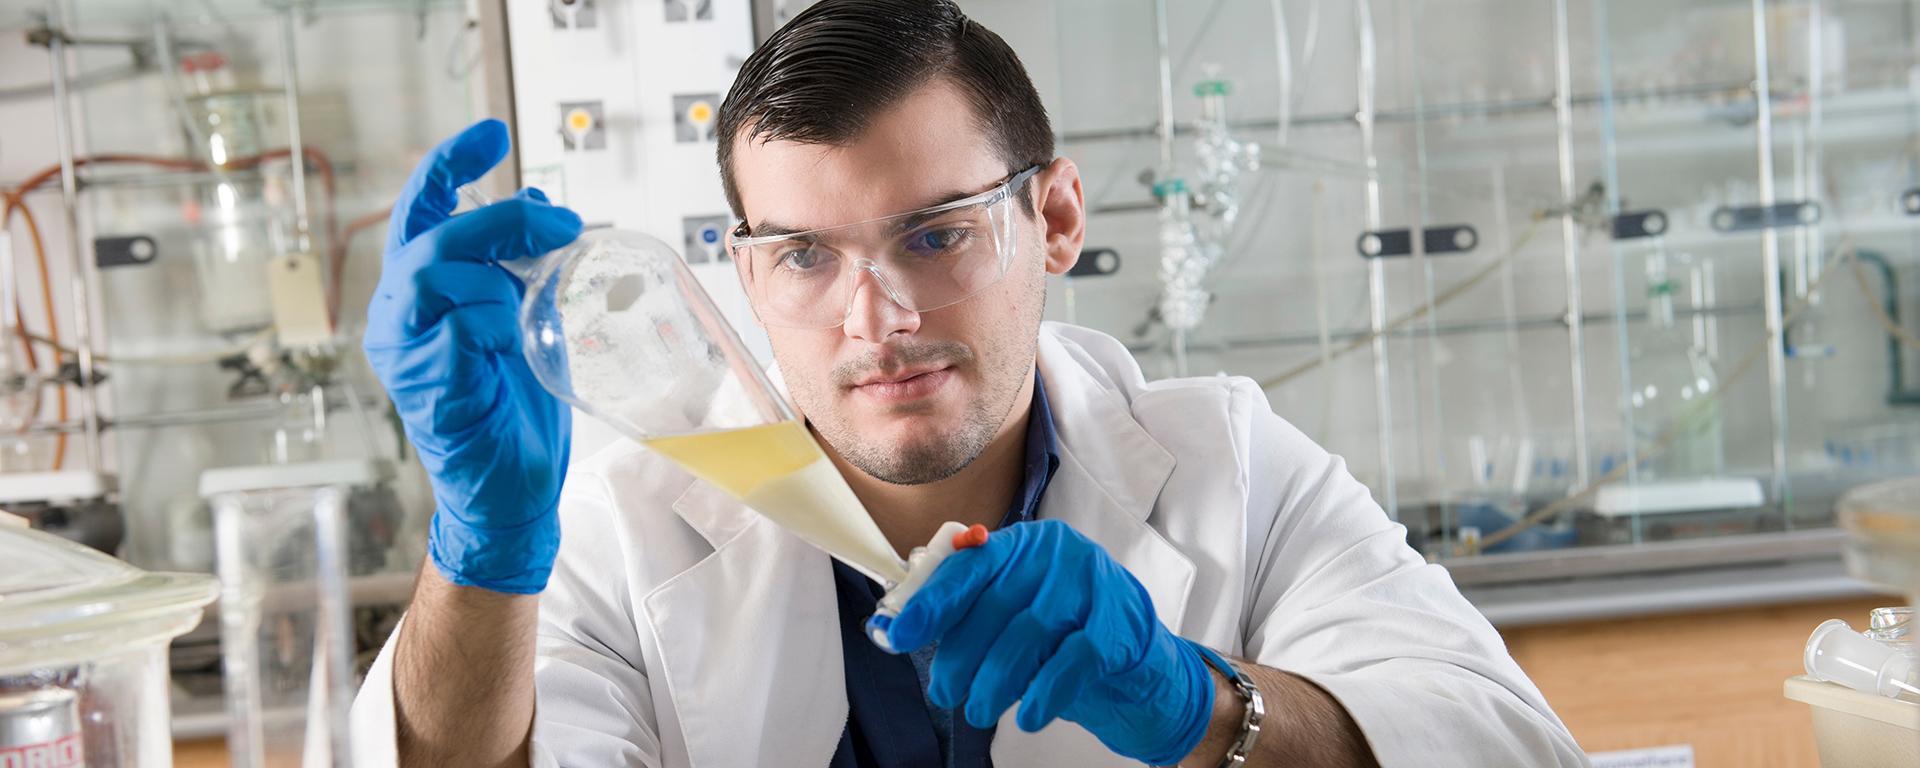 Biochemistry student